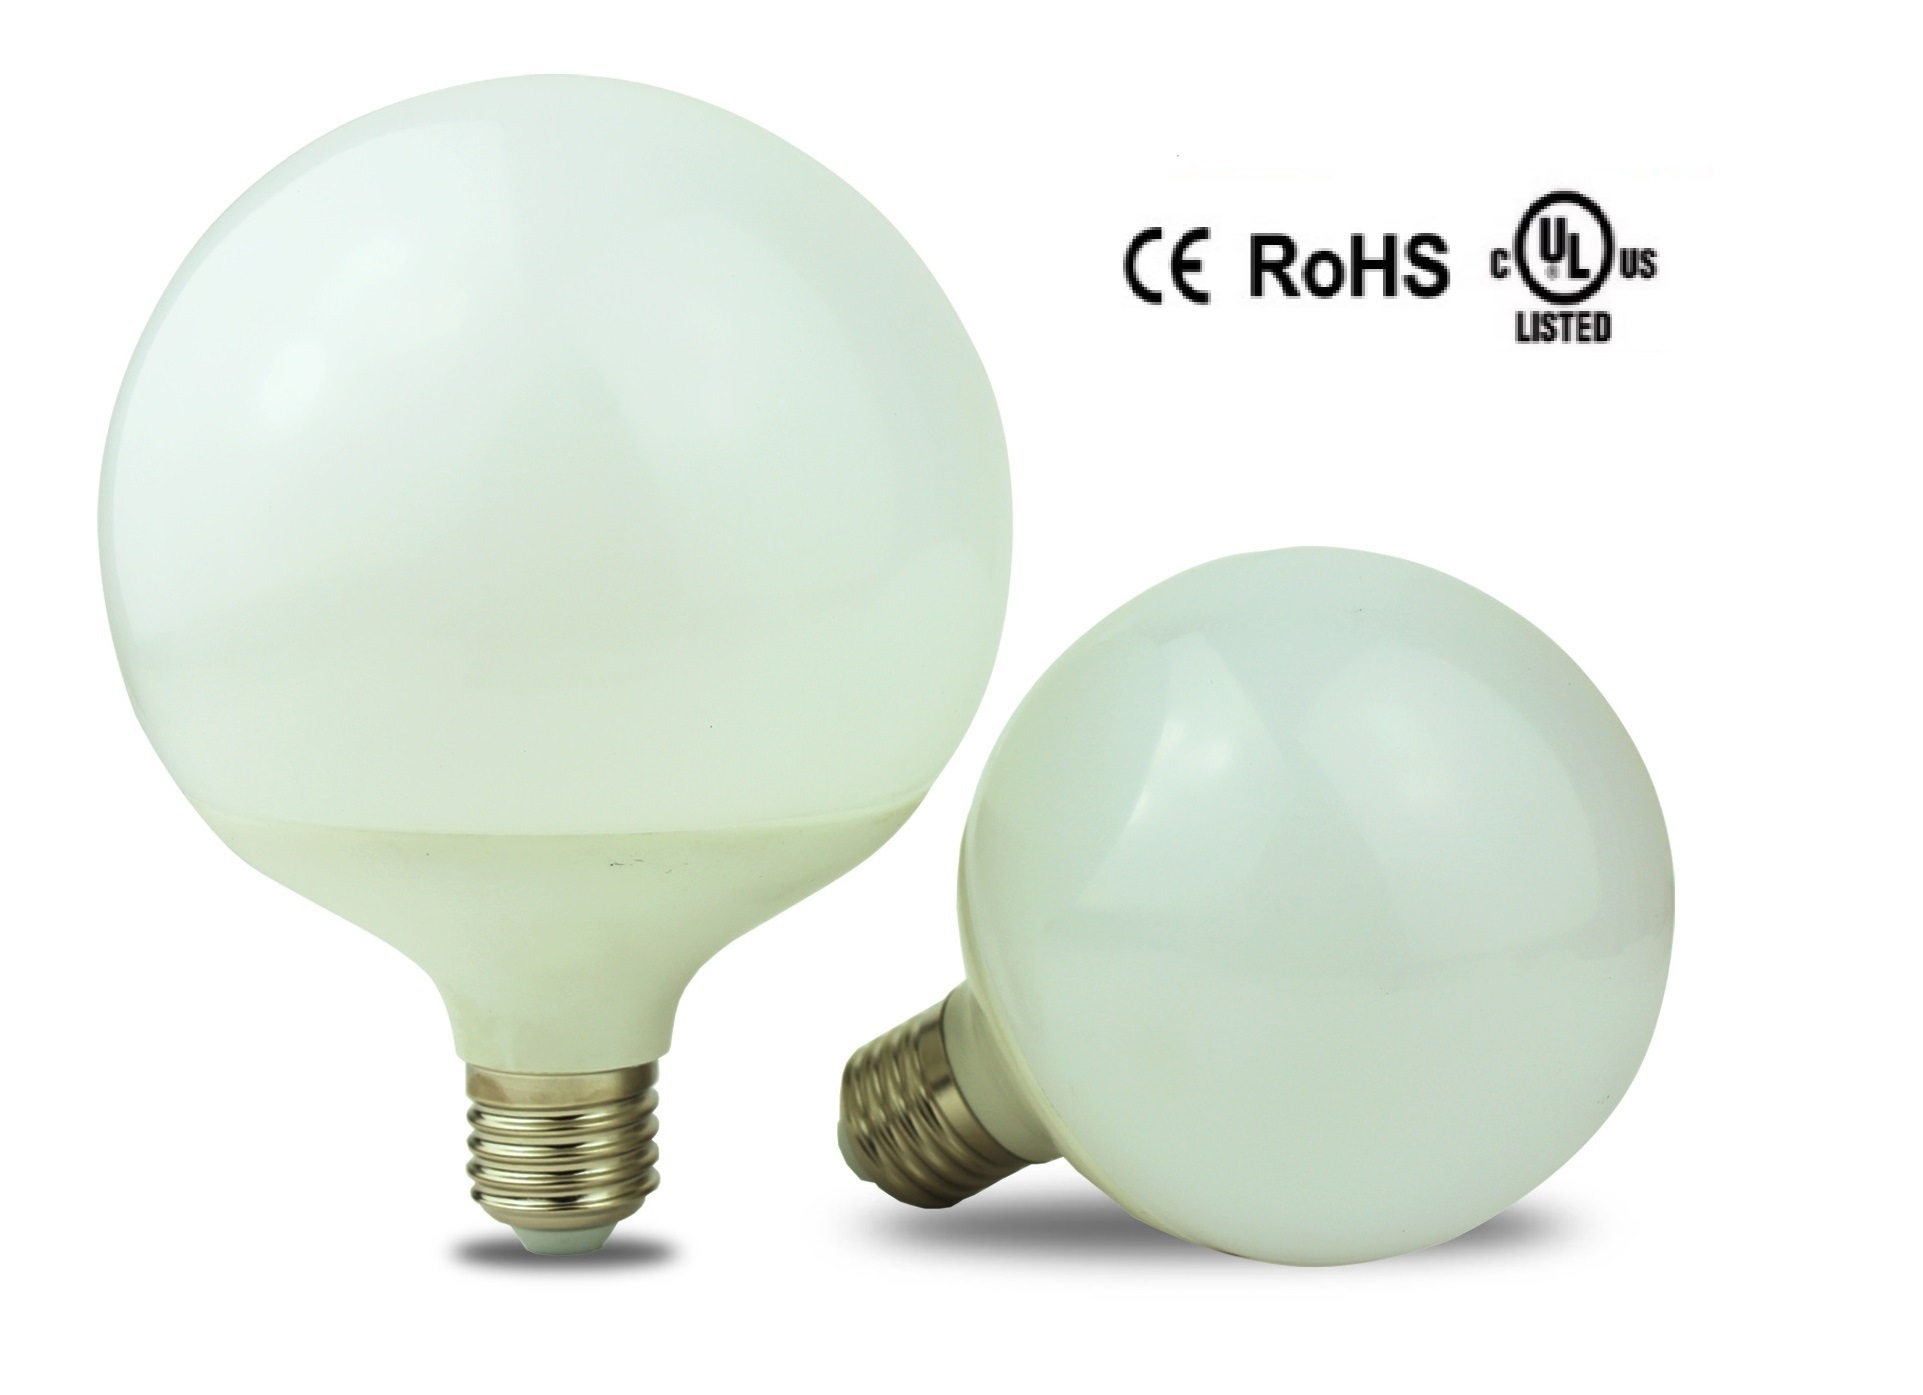 14W E27 Global Aluminum PBT Plastic in Door LED Bulb